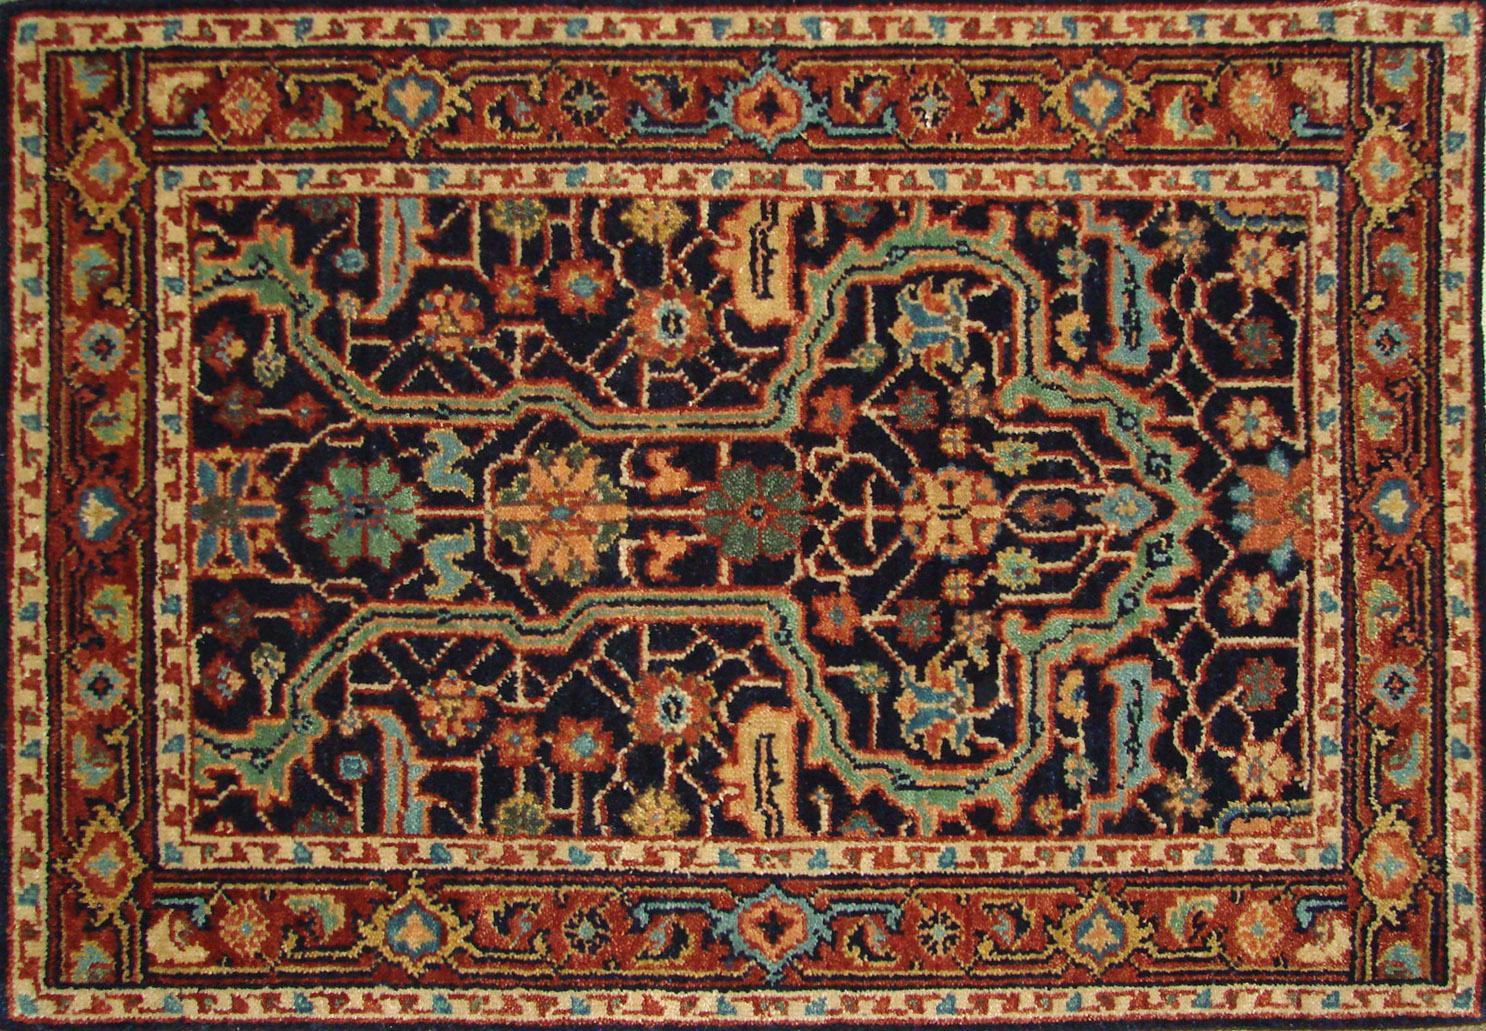 2X3 Heriz/Serapi Hand Knotted Wool Area Rug - MR021792